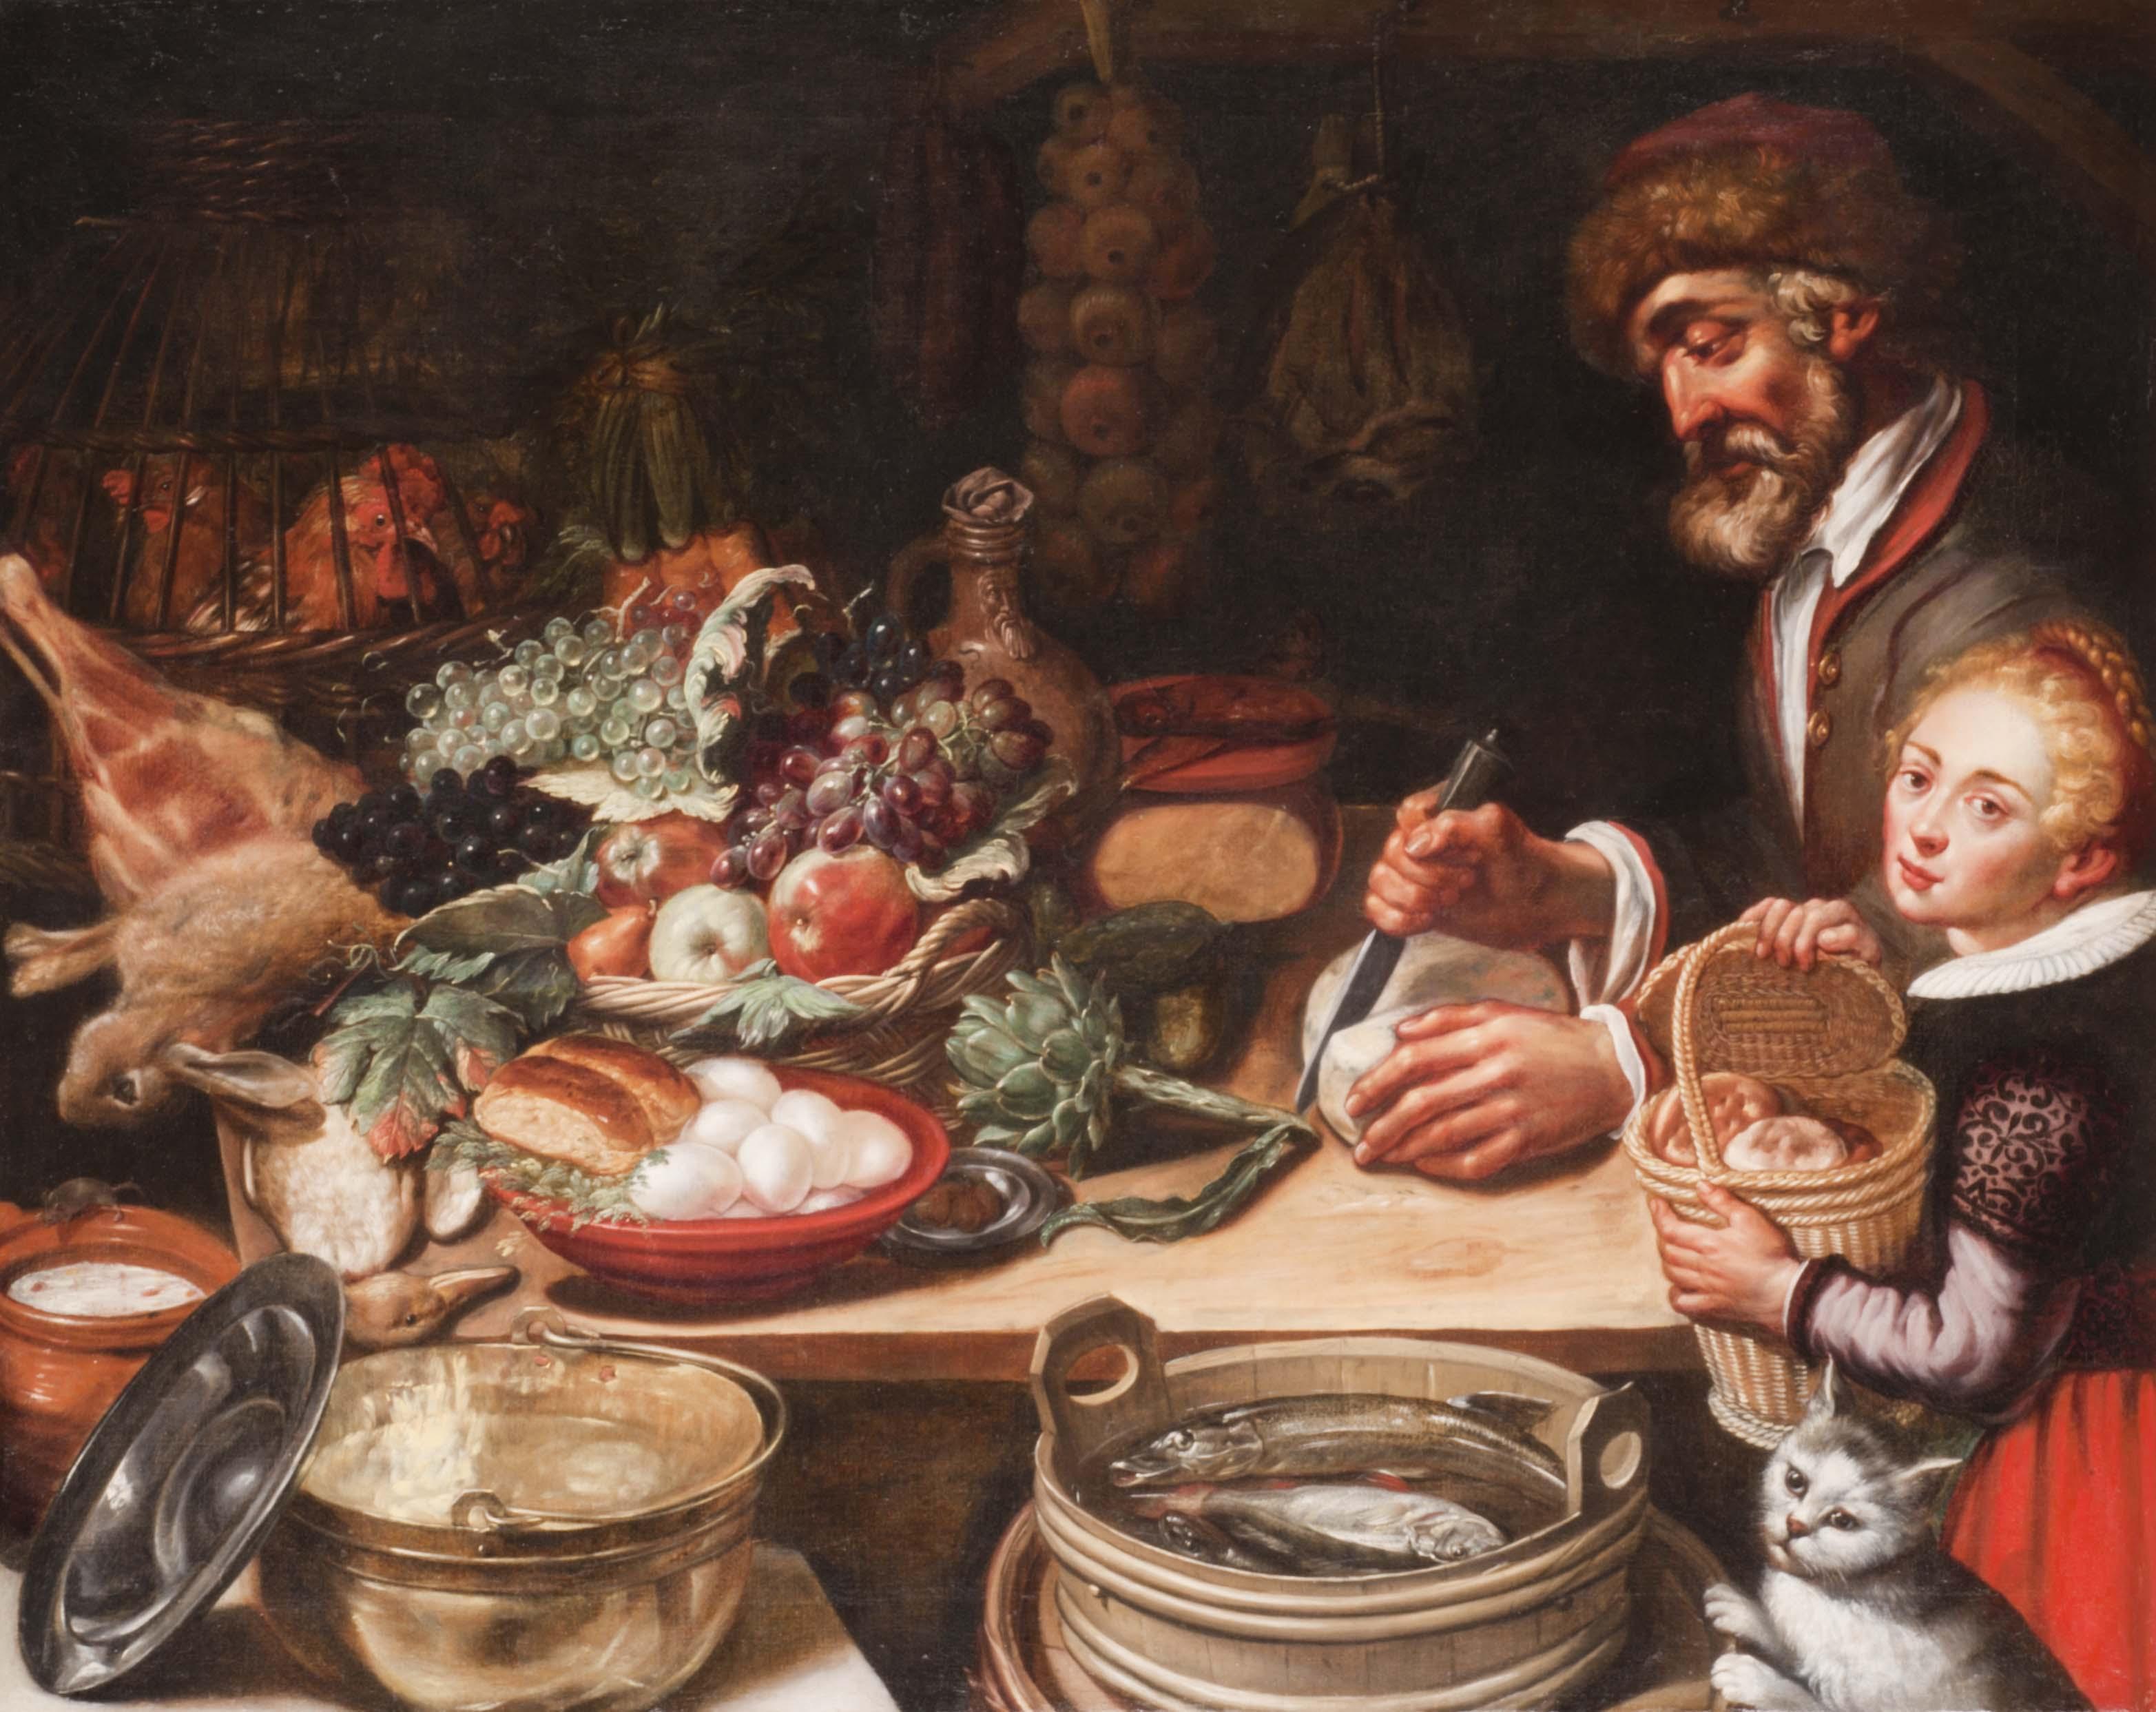 Pieter-Cornelisz-van-Rijck-La-Cucina-del-Contadino-olio-su-tela-1615-ca.